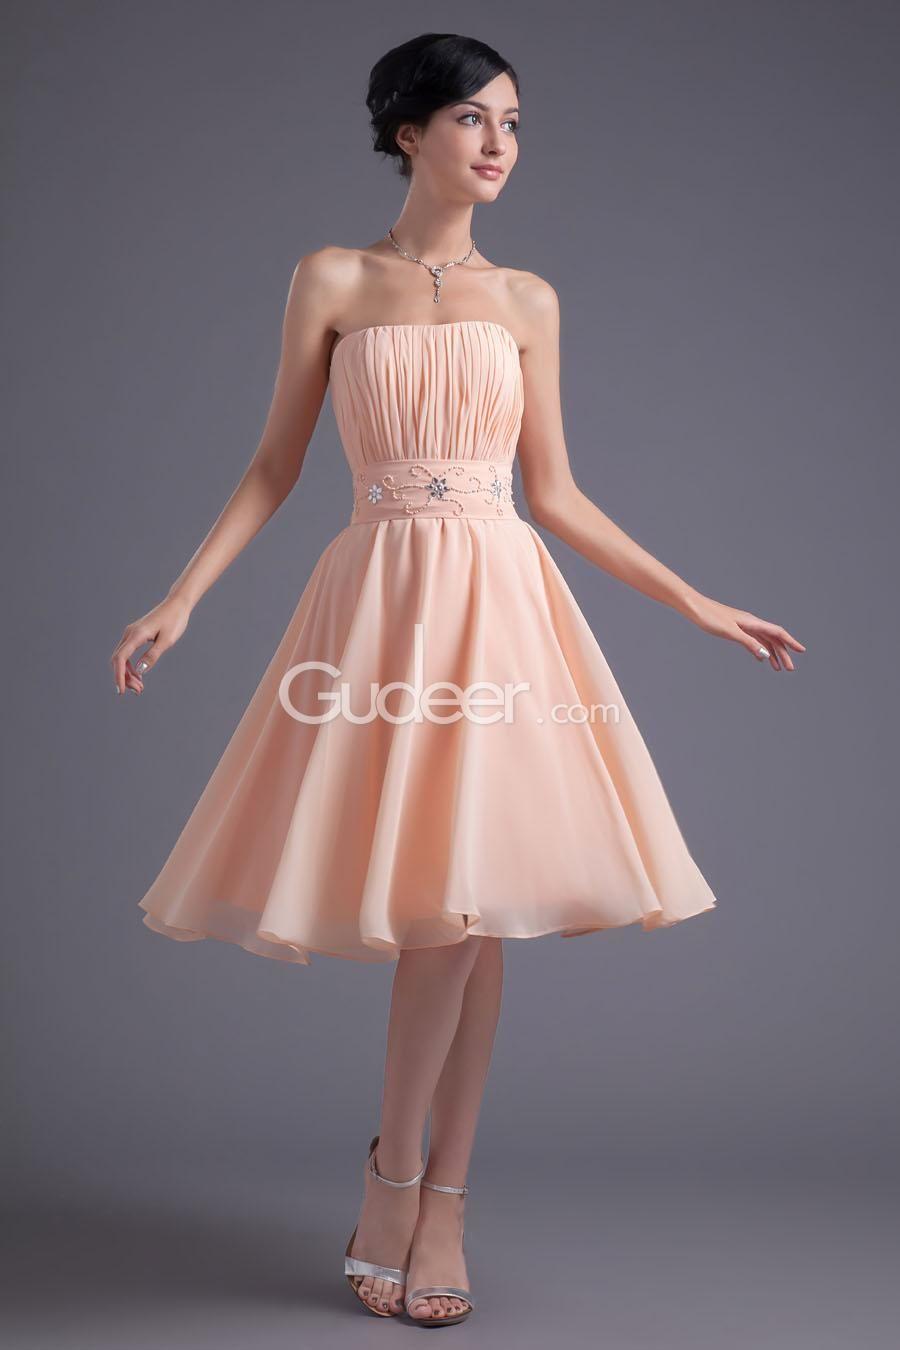 Strapless Pleated Peach Chiffon Knee Length A-line Cocktail Dress ...